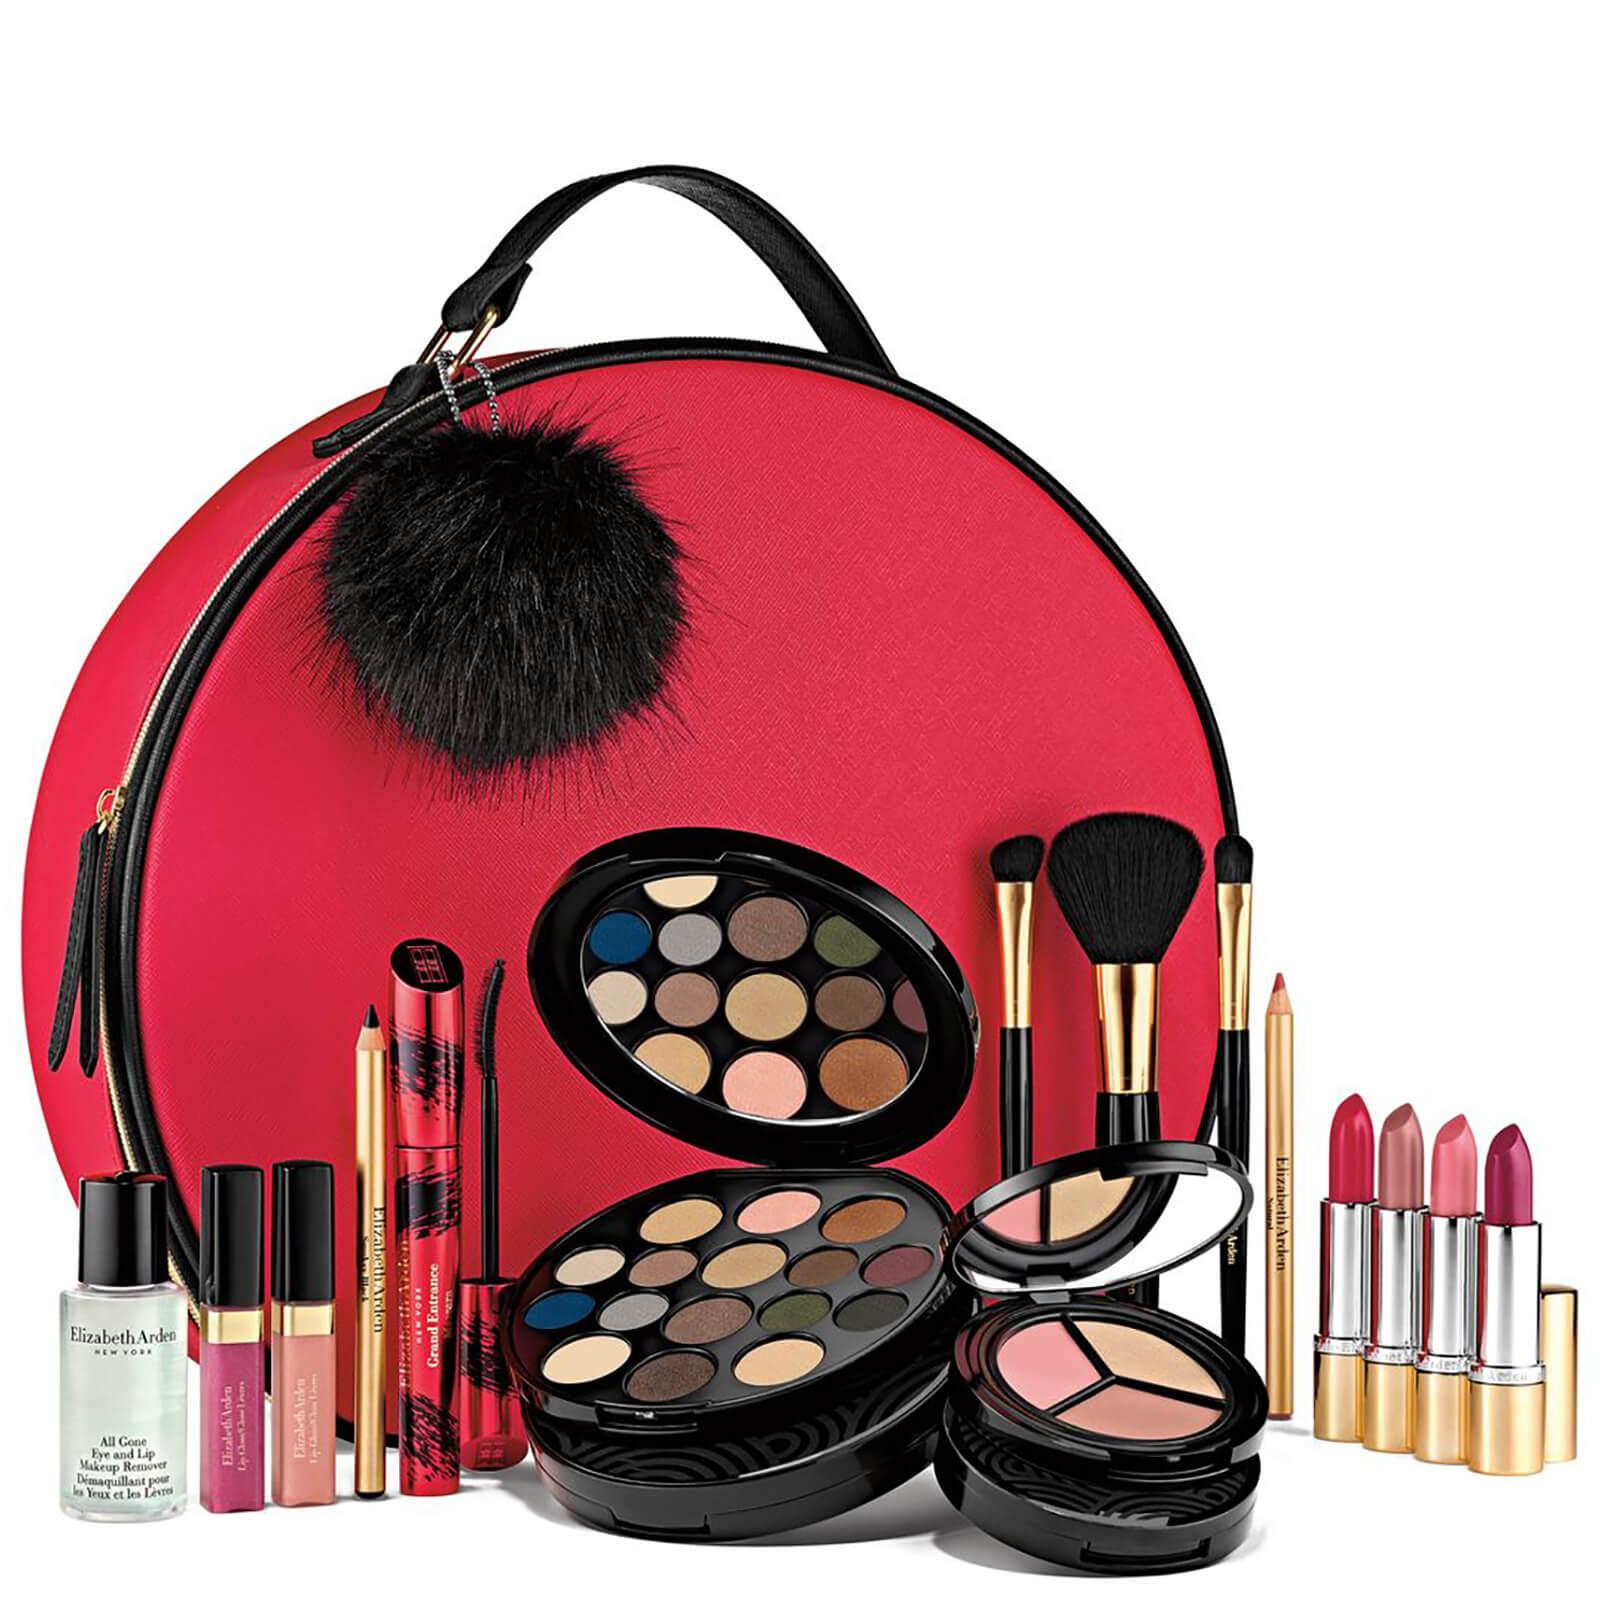 elizabeth arden makeup - HD1600×1600